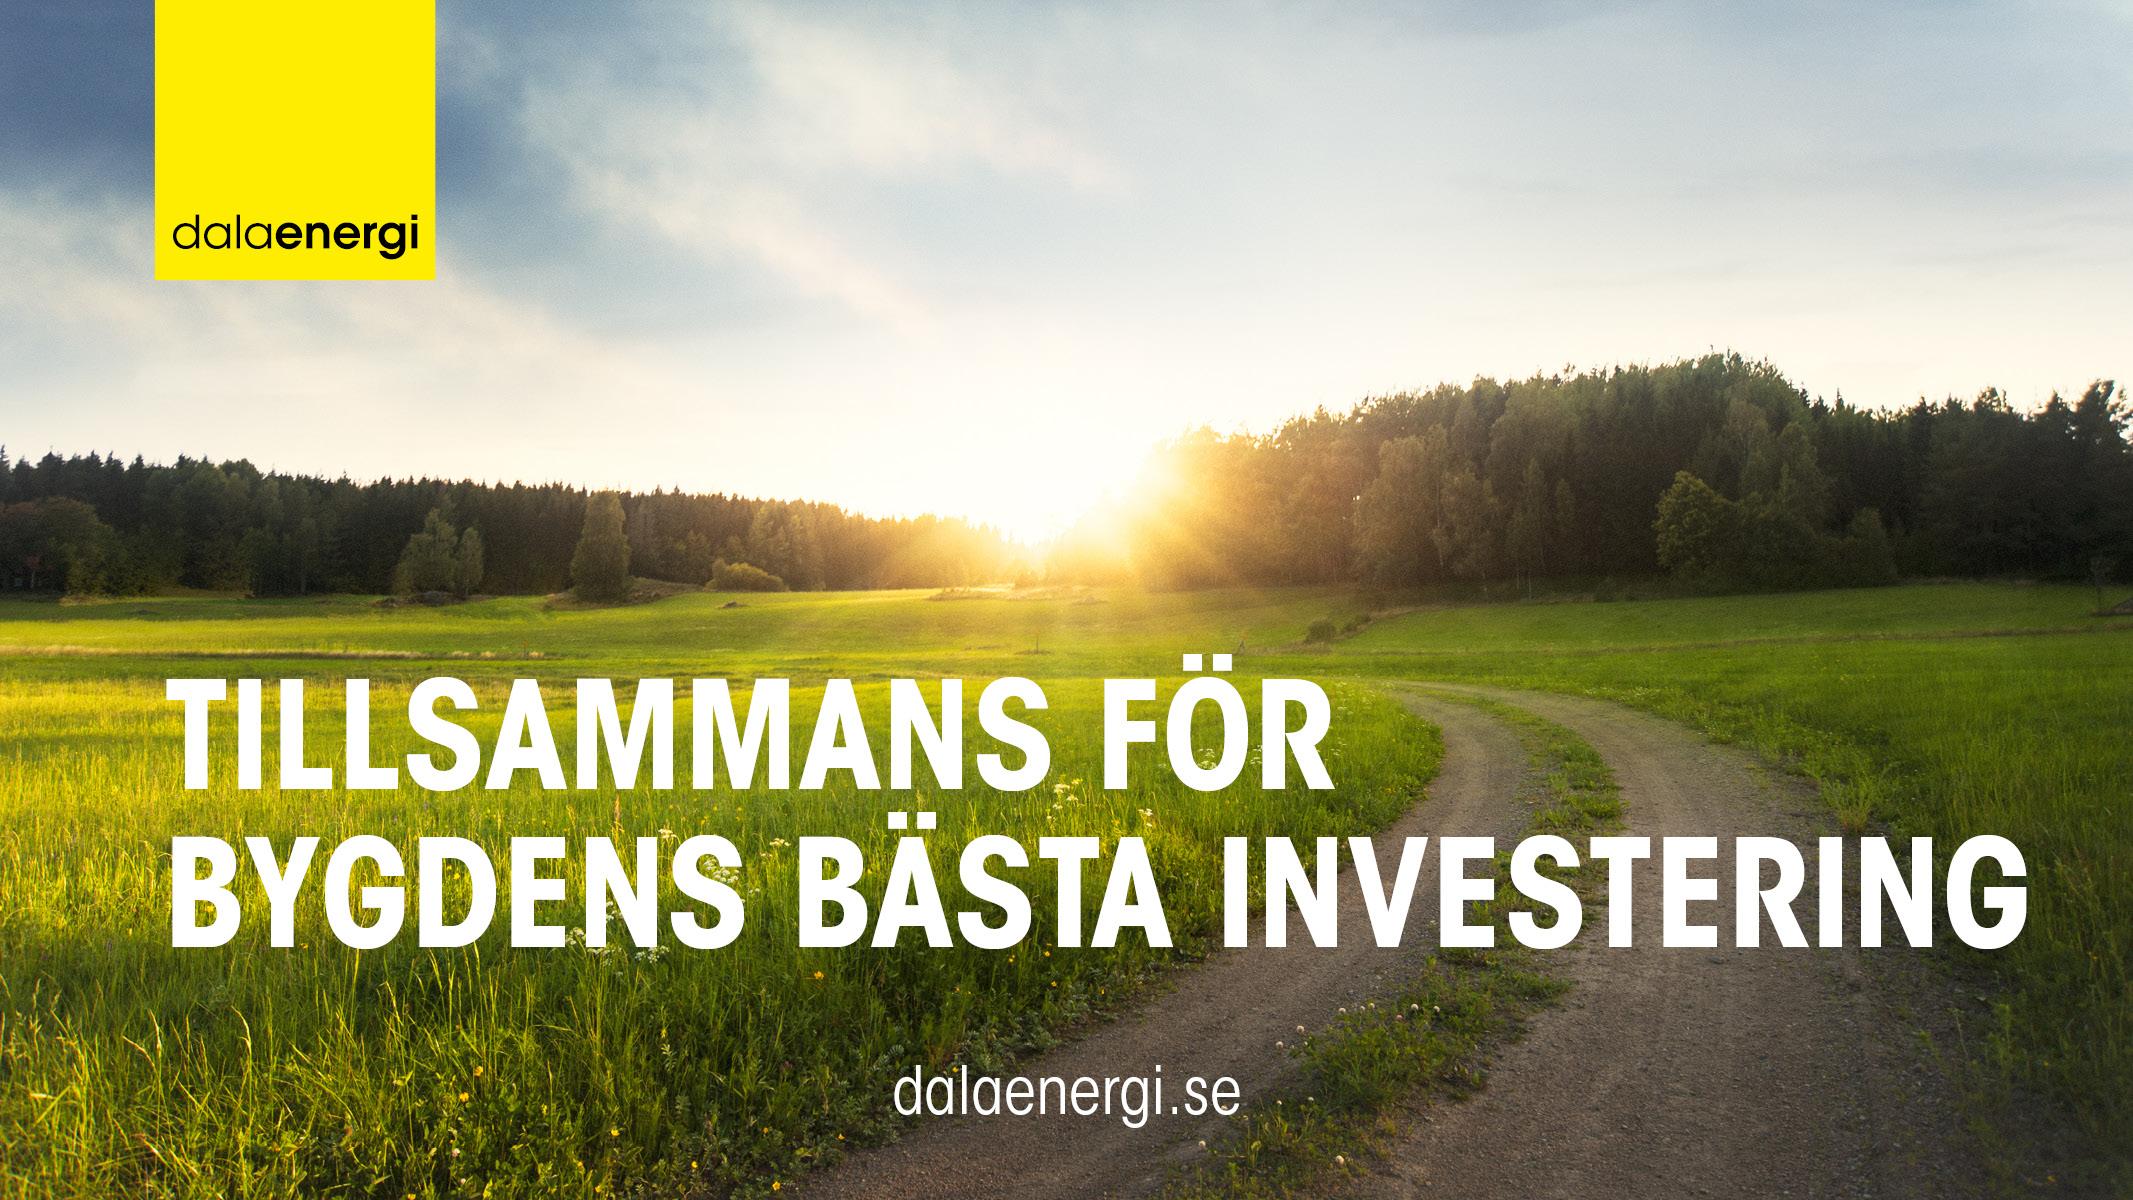 Anna Nilsson, Rgbacksgattu 7, Siljansns | omr-scanner.net